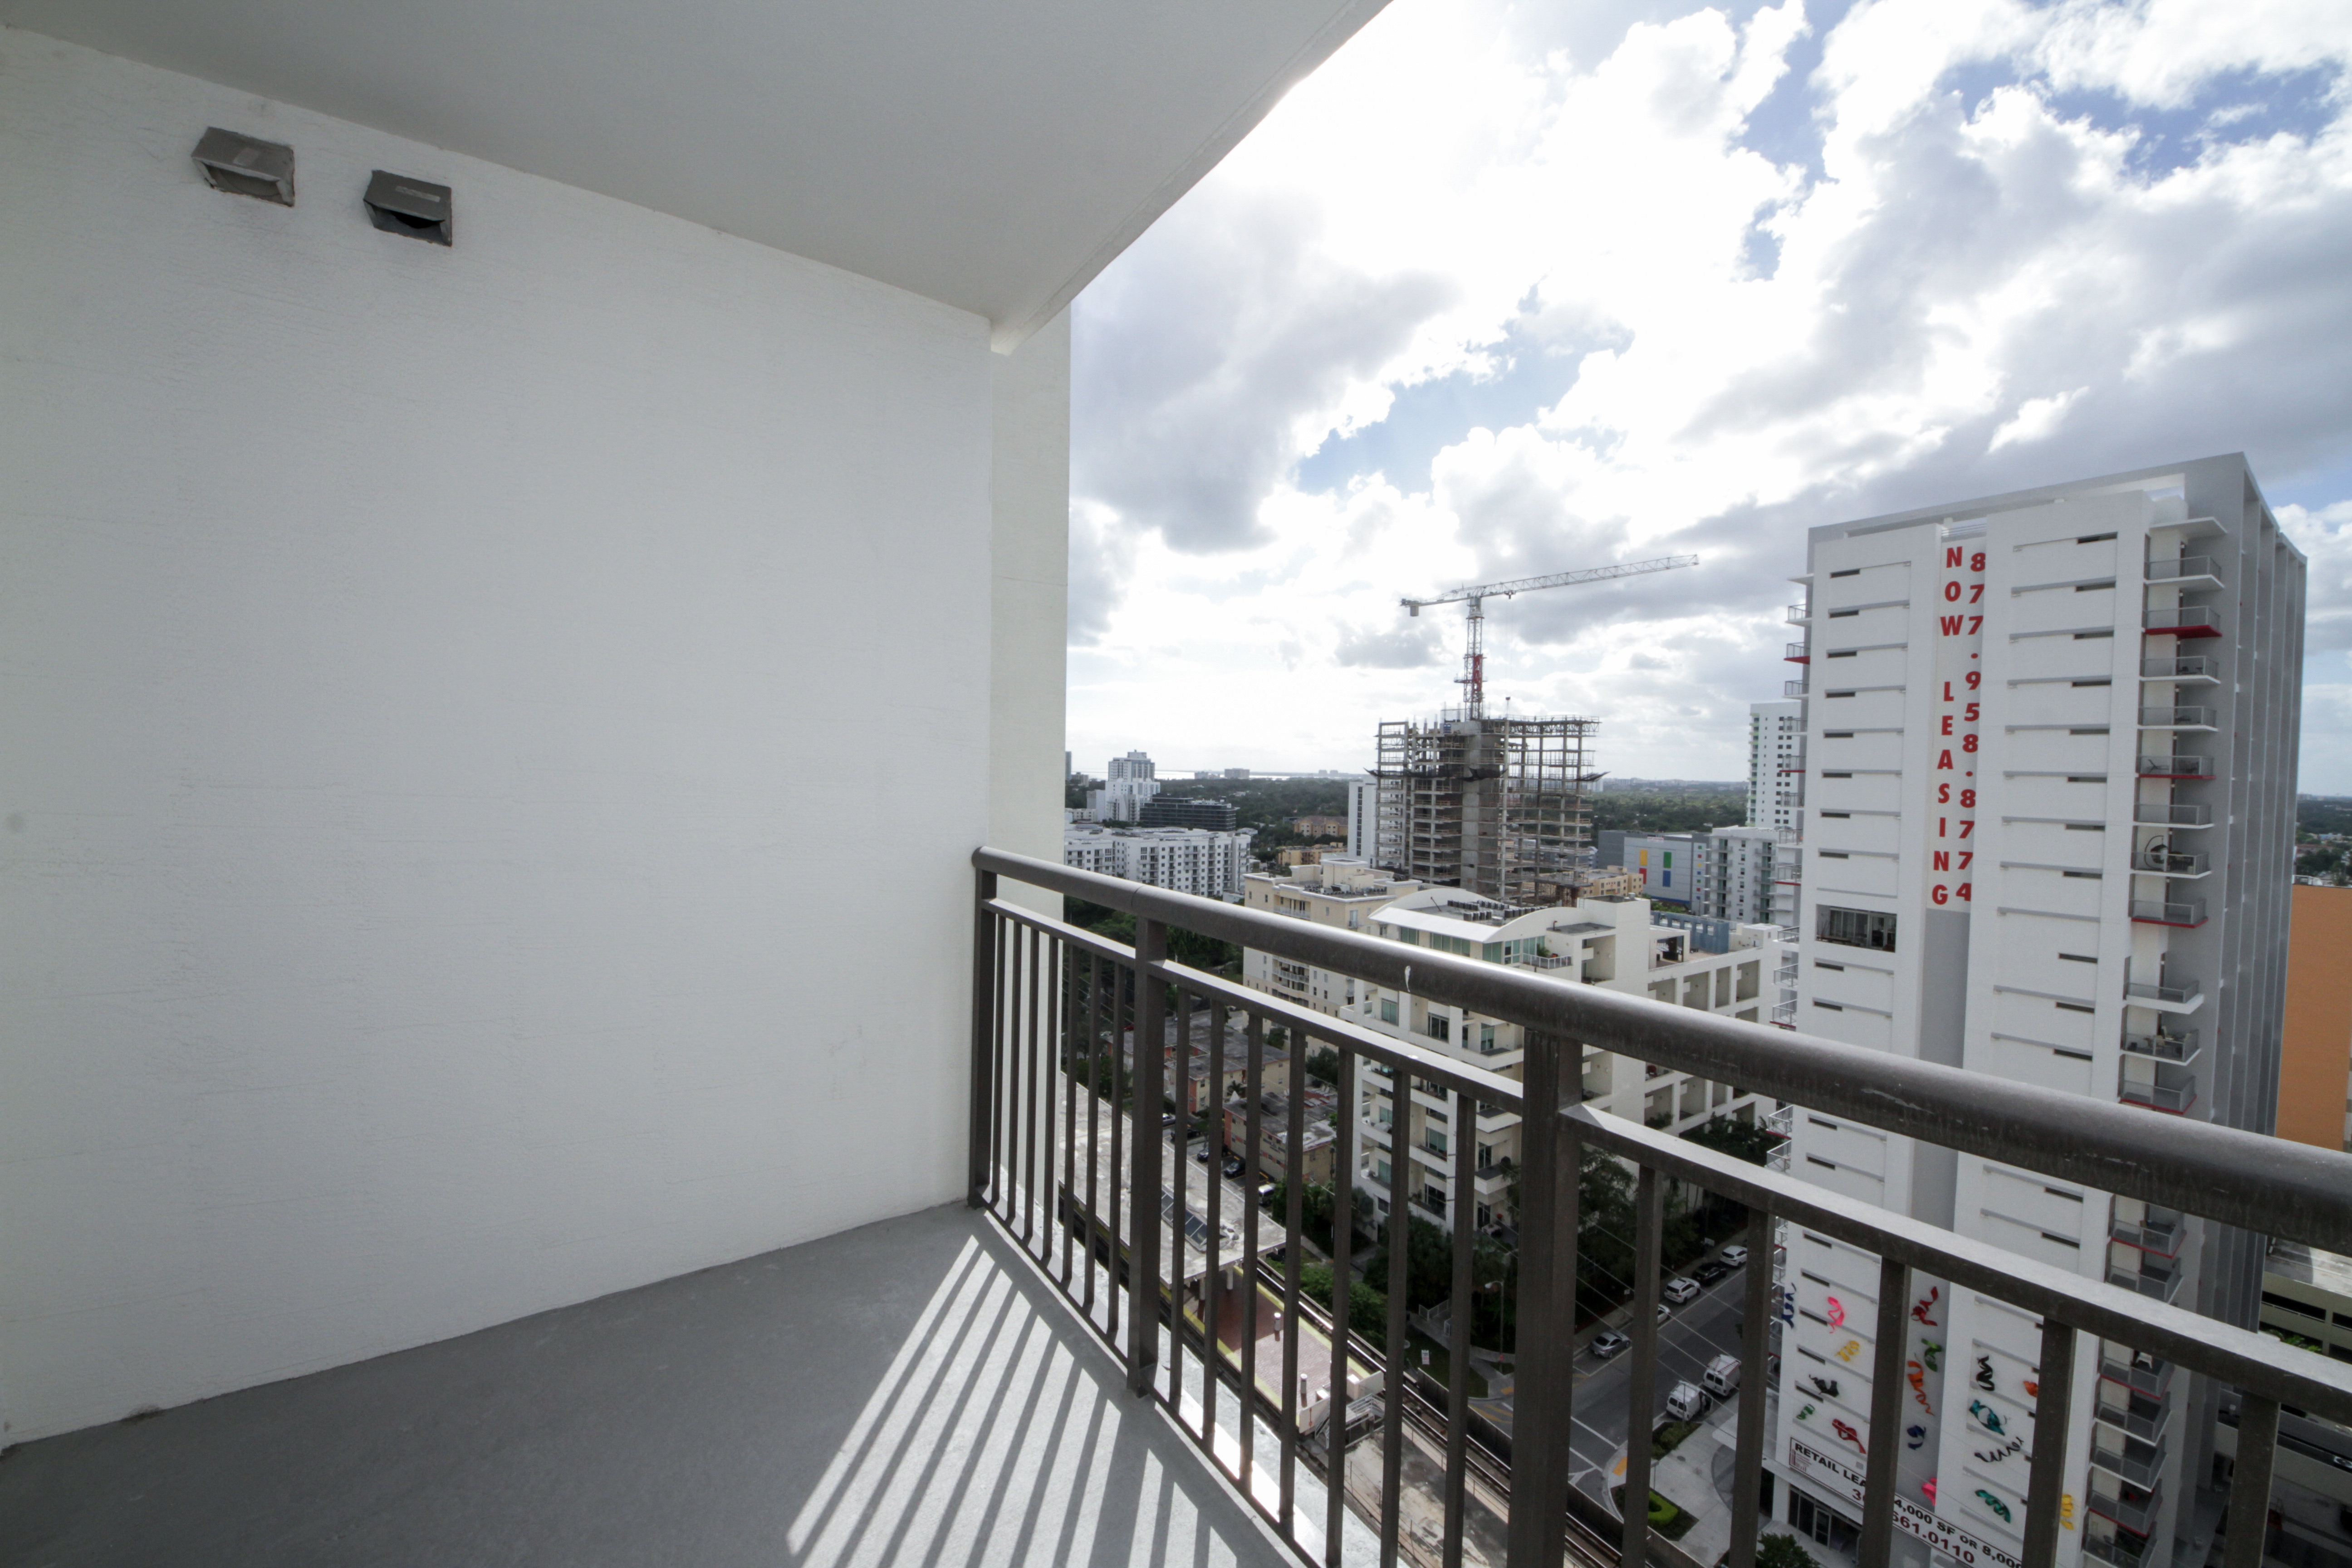 Condominium for Sale at 999 Sw 1st Ave #1806 999 Sw 1st Ave 1806 Miami, Florida, 33130 United States